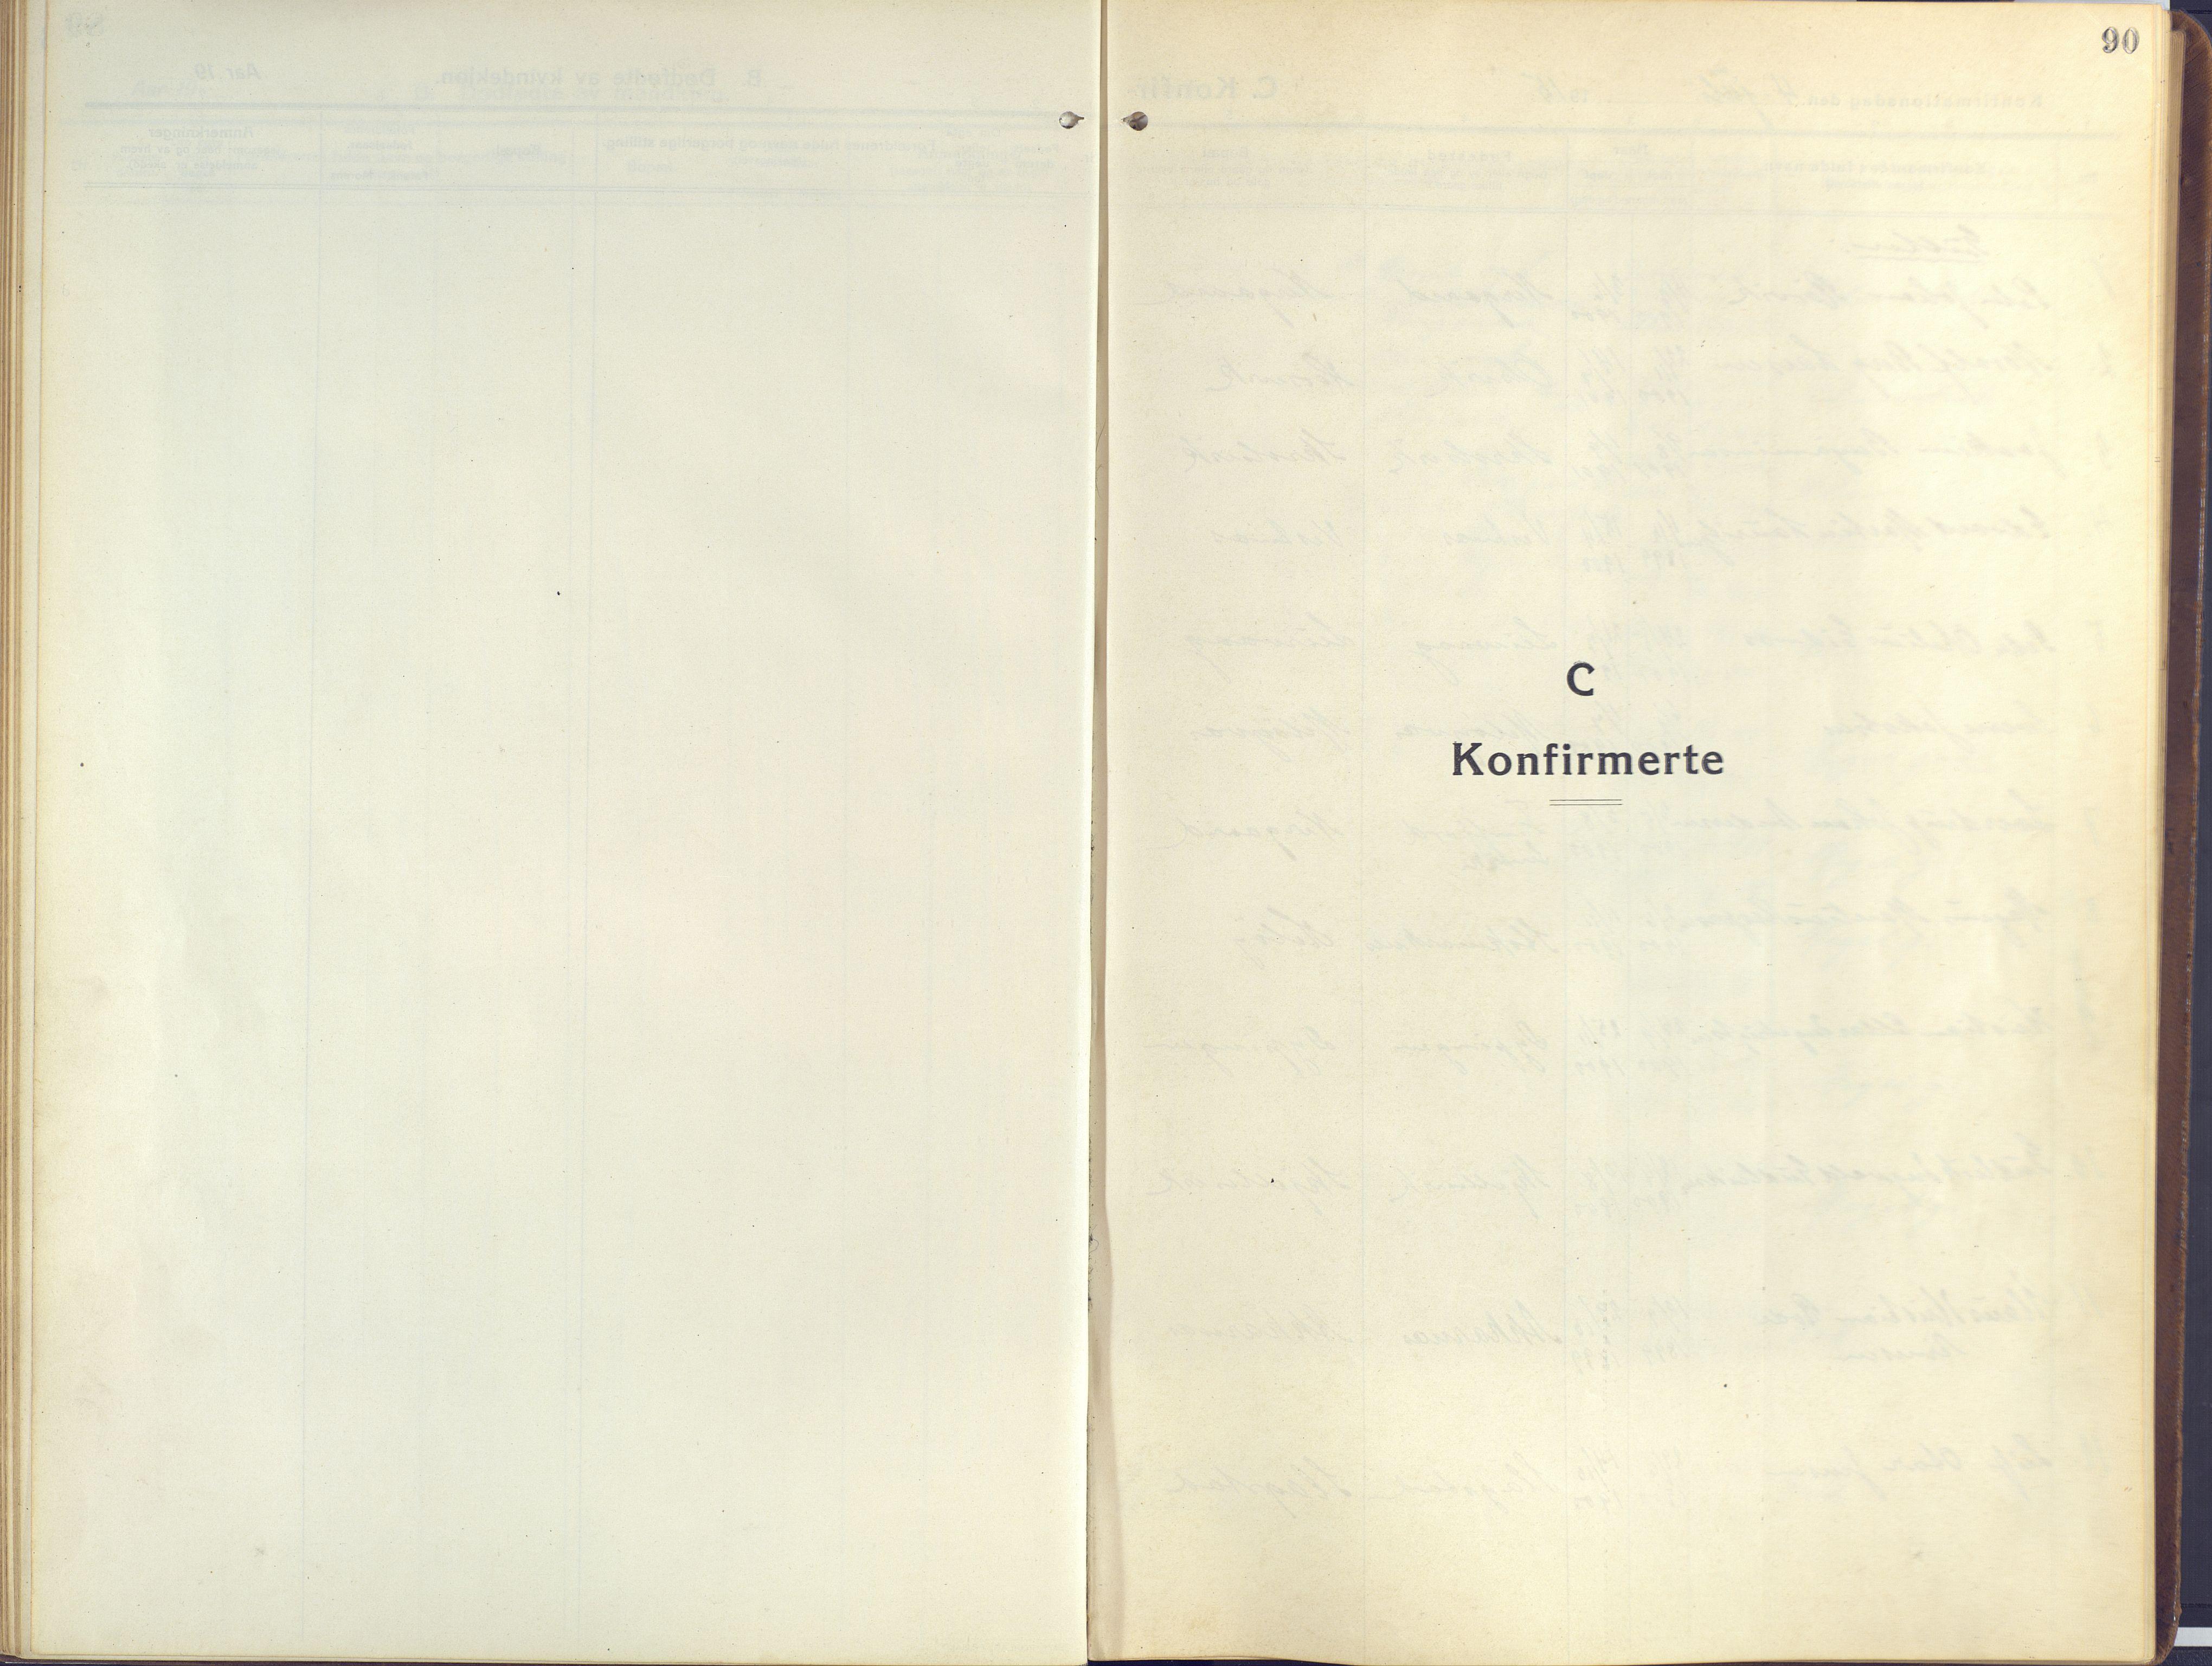 SATØ, Sand/Bjarkøy sokneprestkontor, I/Ia/Iaa/L0006kirke: Ministerialbok nr. 6, 1915-1929, s. 90